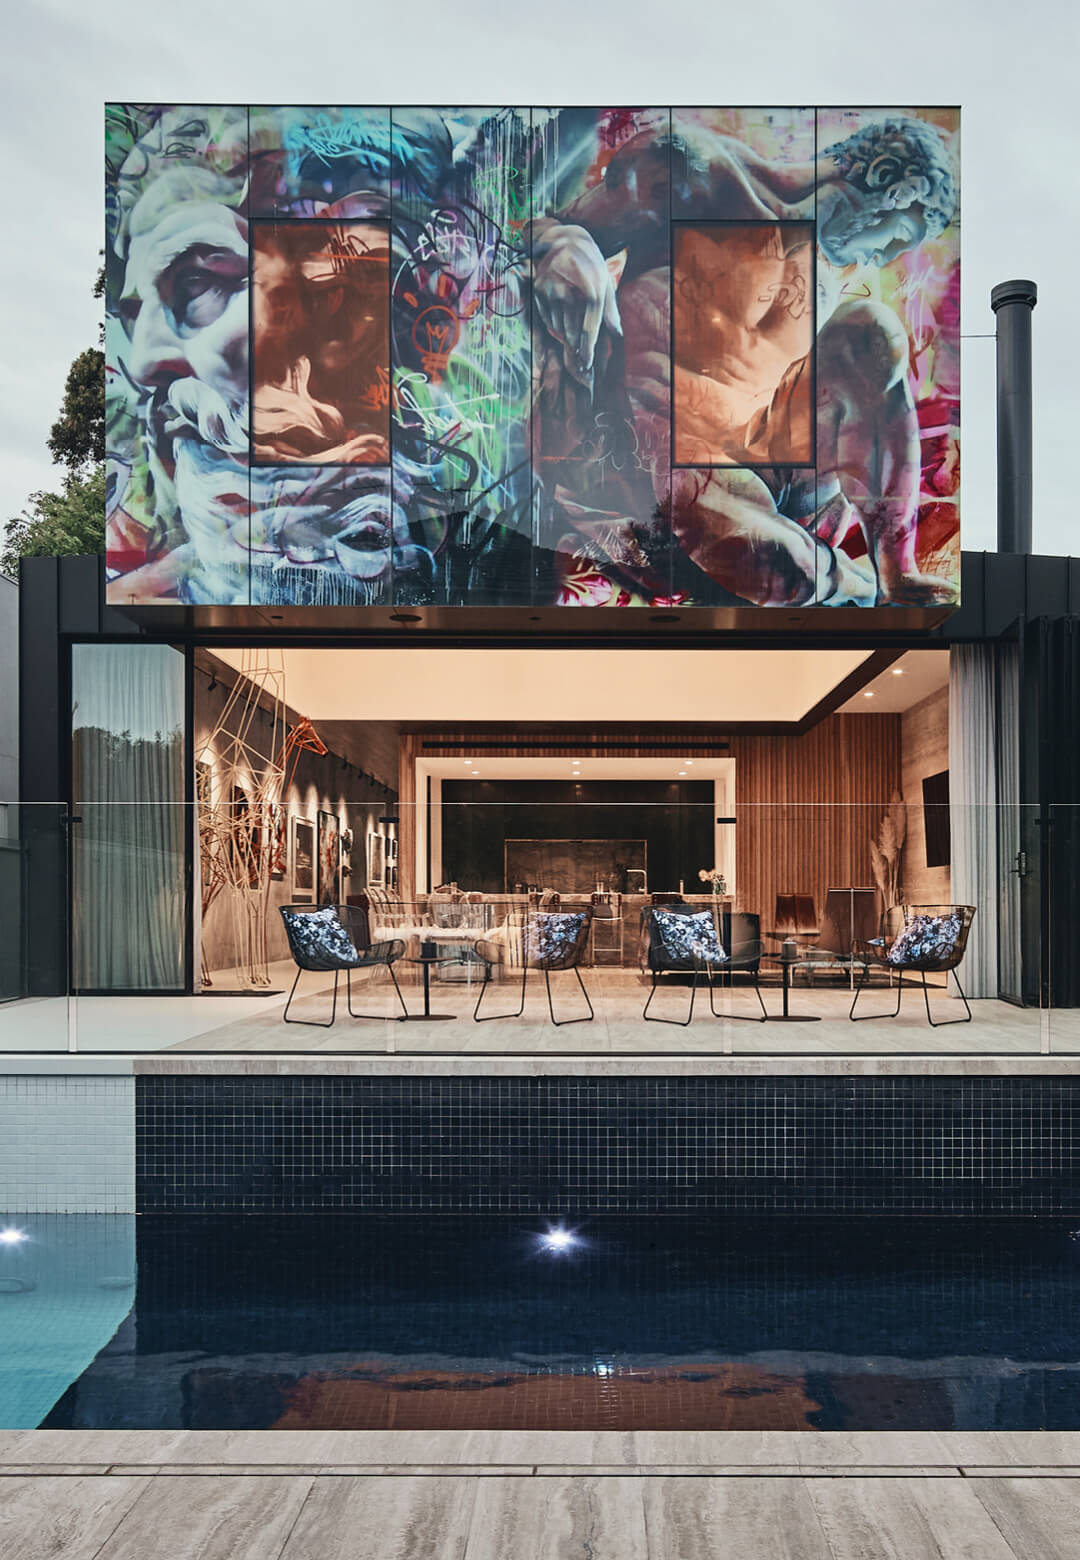 JARtB House by Kavellaris Urban Design in Melbourne, Australia, features a Digiglass façade mural with artwork by PichiAvo   JARtB House by Kavellaris Urban Design   STIRworld